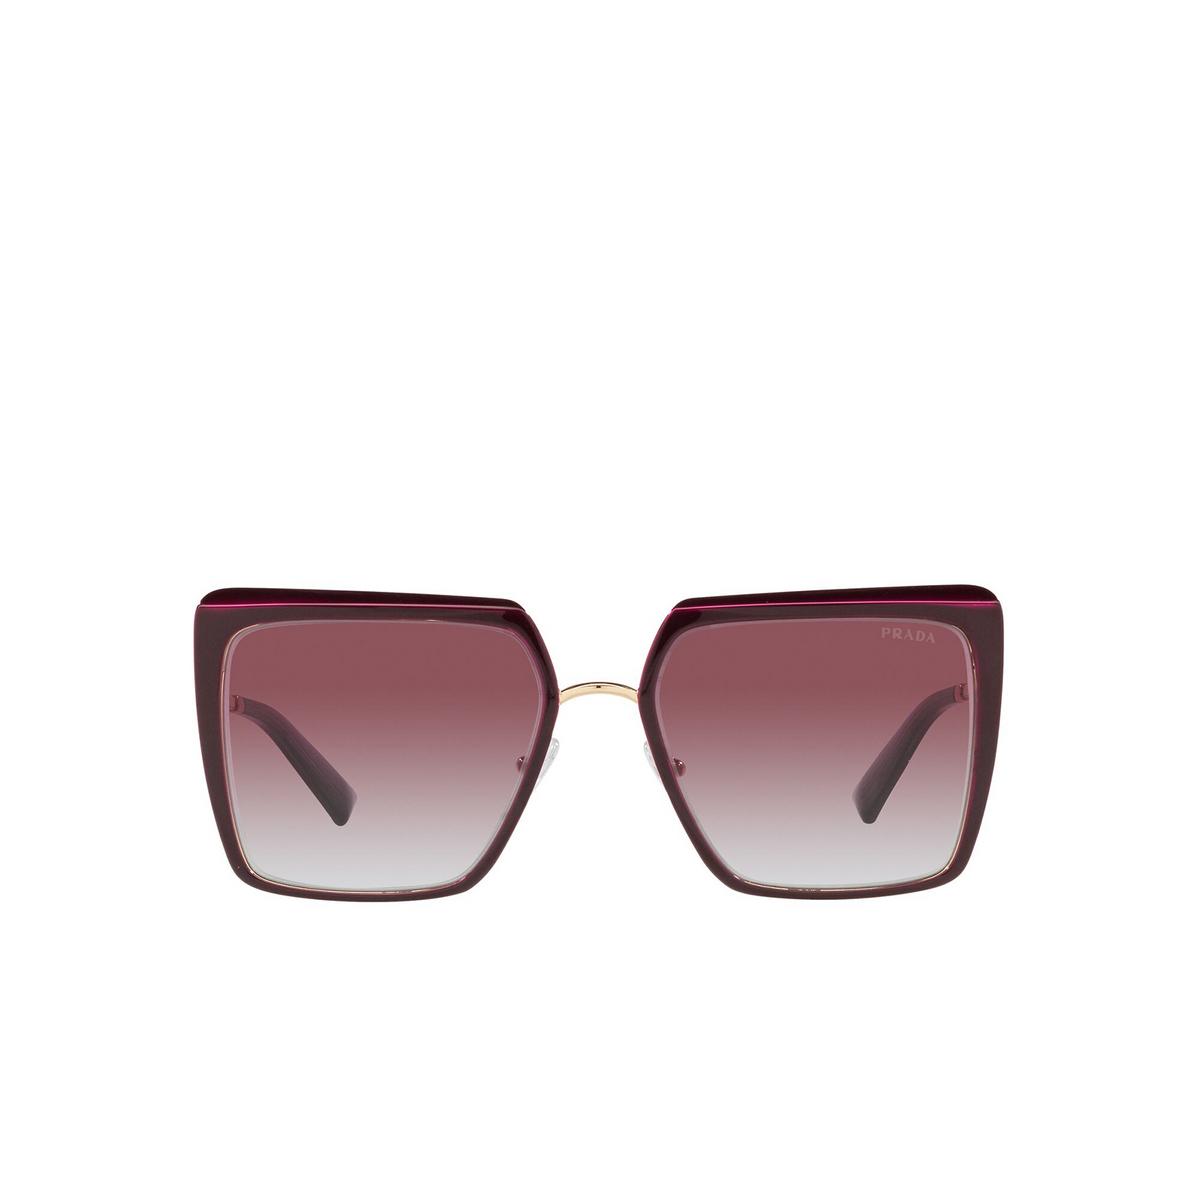 Prada® Square Sunglasses: PR 58WS color Garnet VIY412 - front view.